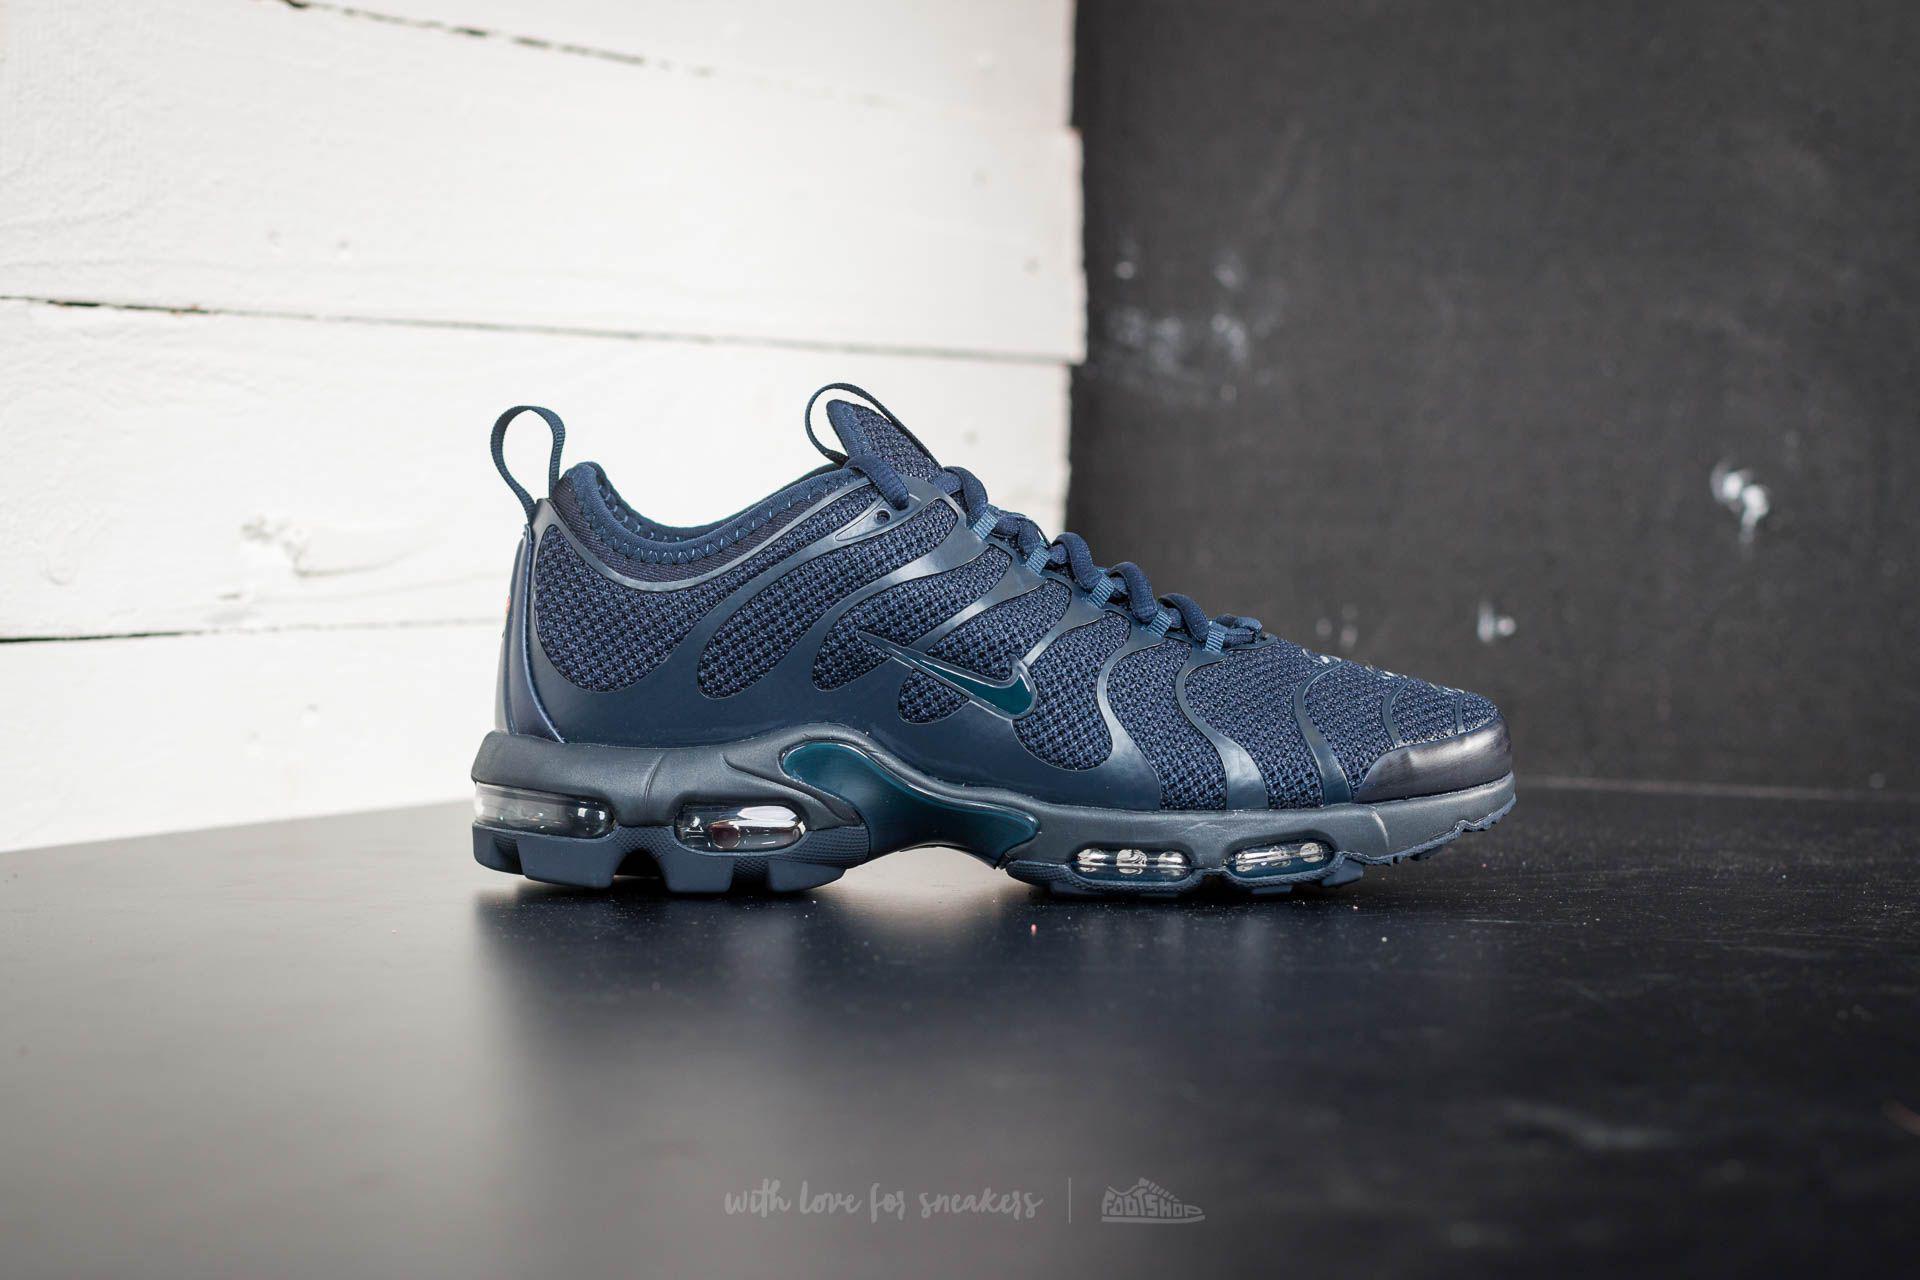 Nike Air Max Plus Tn Ultra In Blue